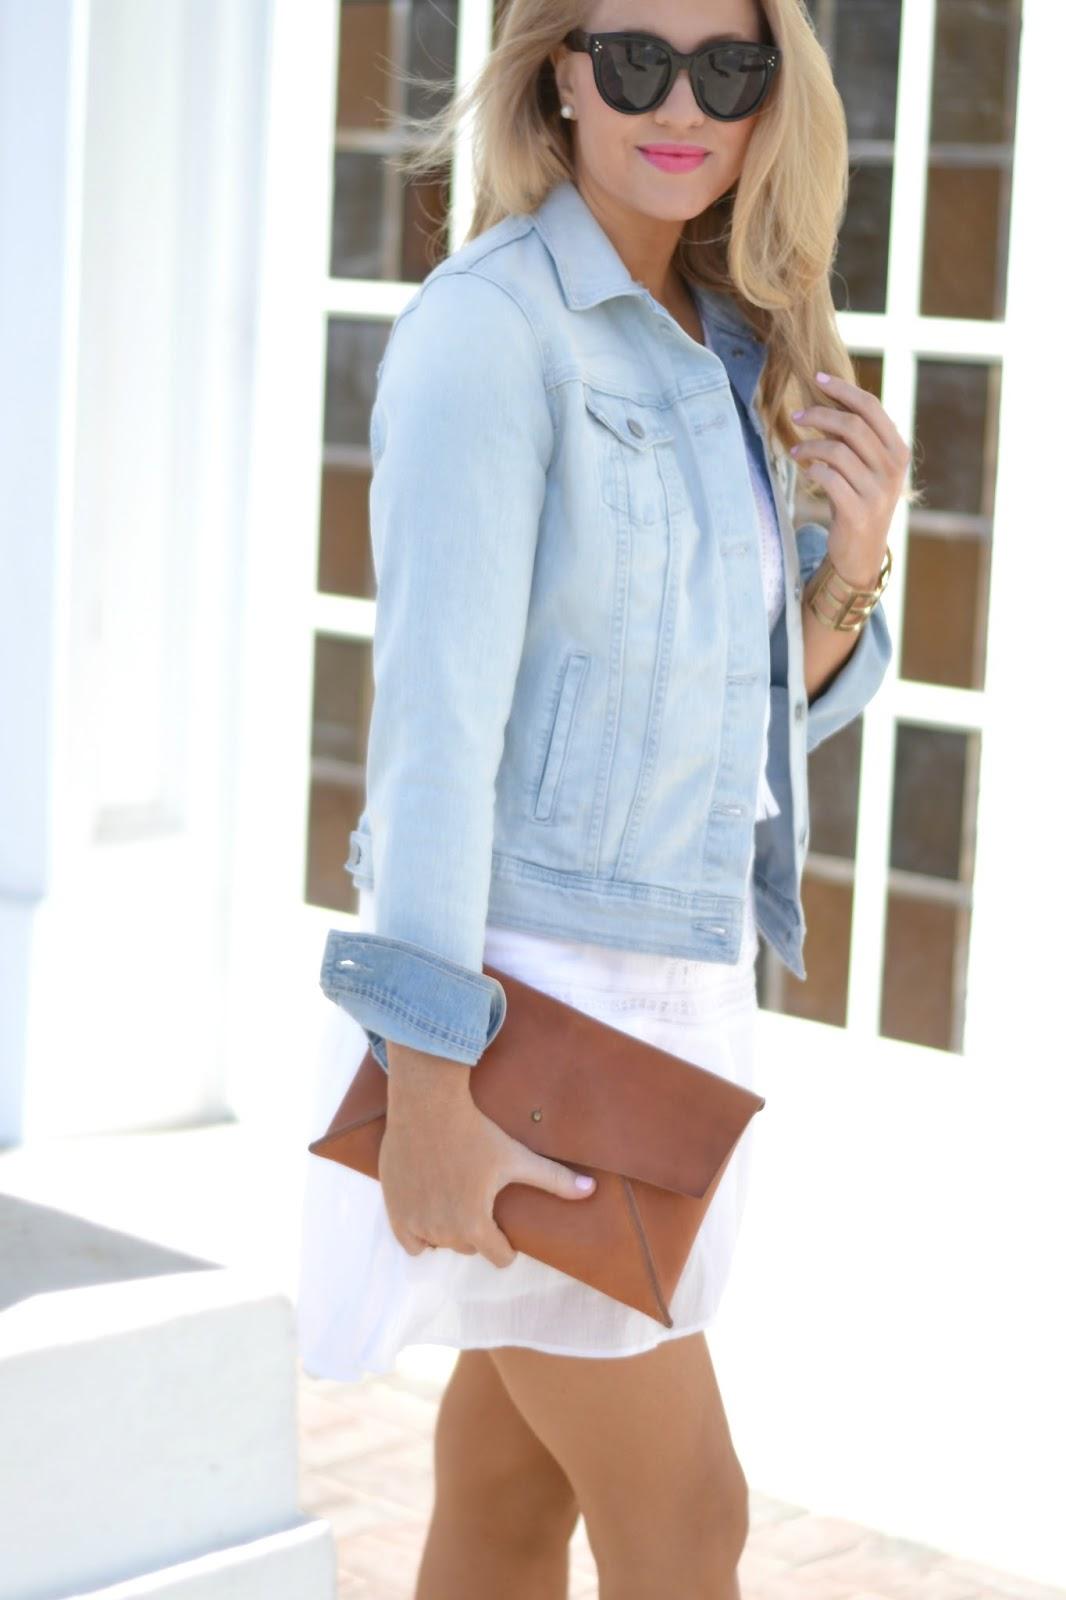 laura-platt-chicago-style-blogger